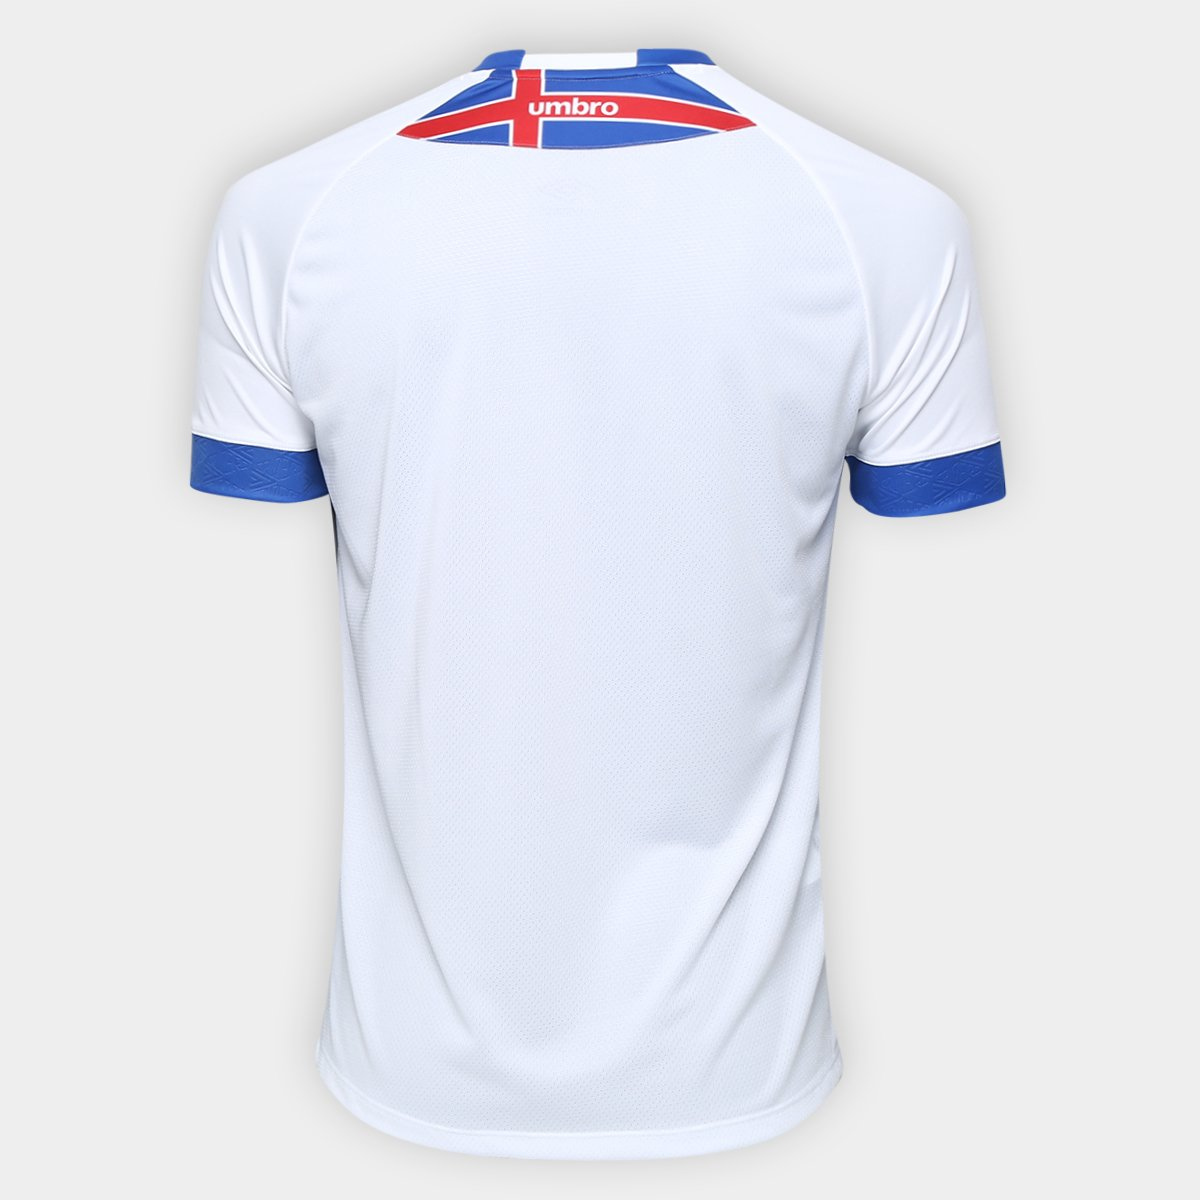 ... Camisa Cruzeiro II 2018 s n° C  Patrocínio Blár Vikingur - Torcedor  Umbro ... 976d4ab1ce9c1